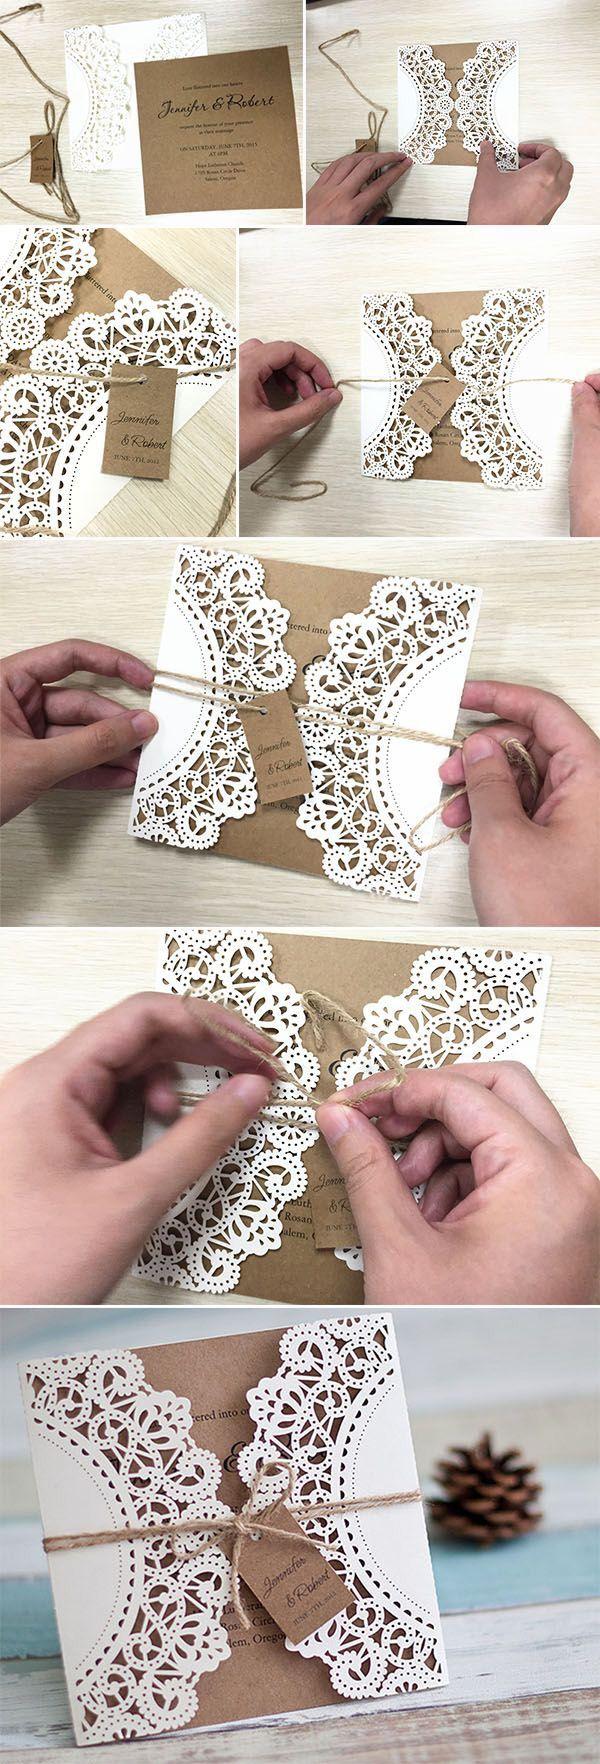 DIY rustic wedding inviations